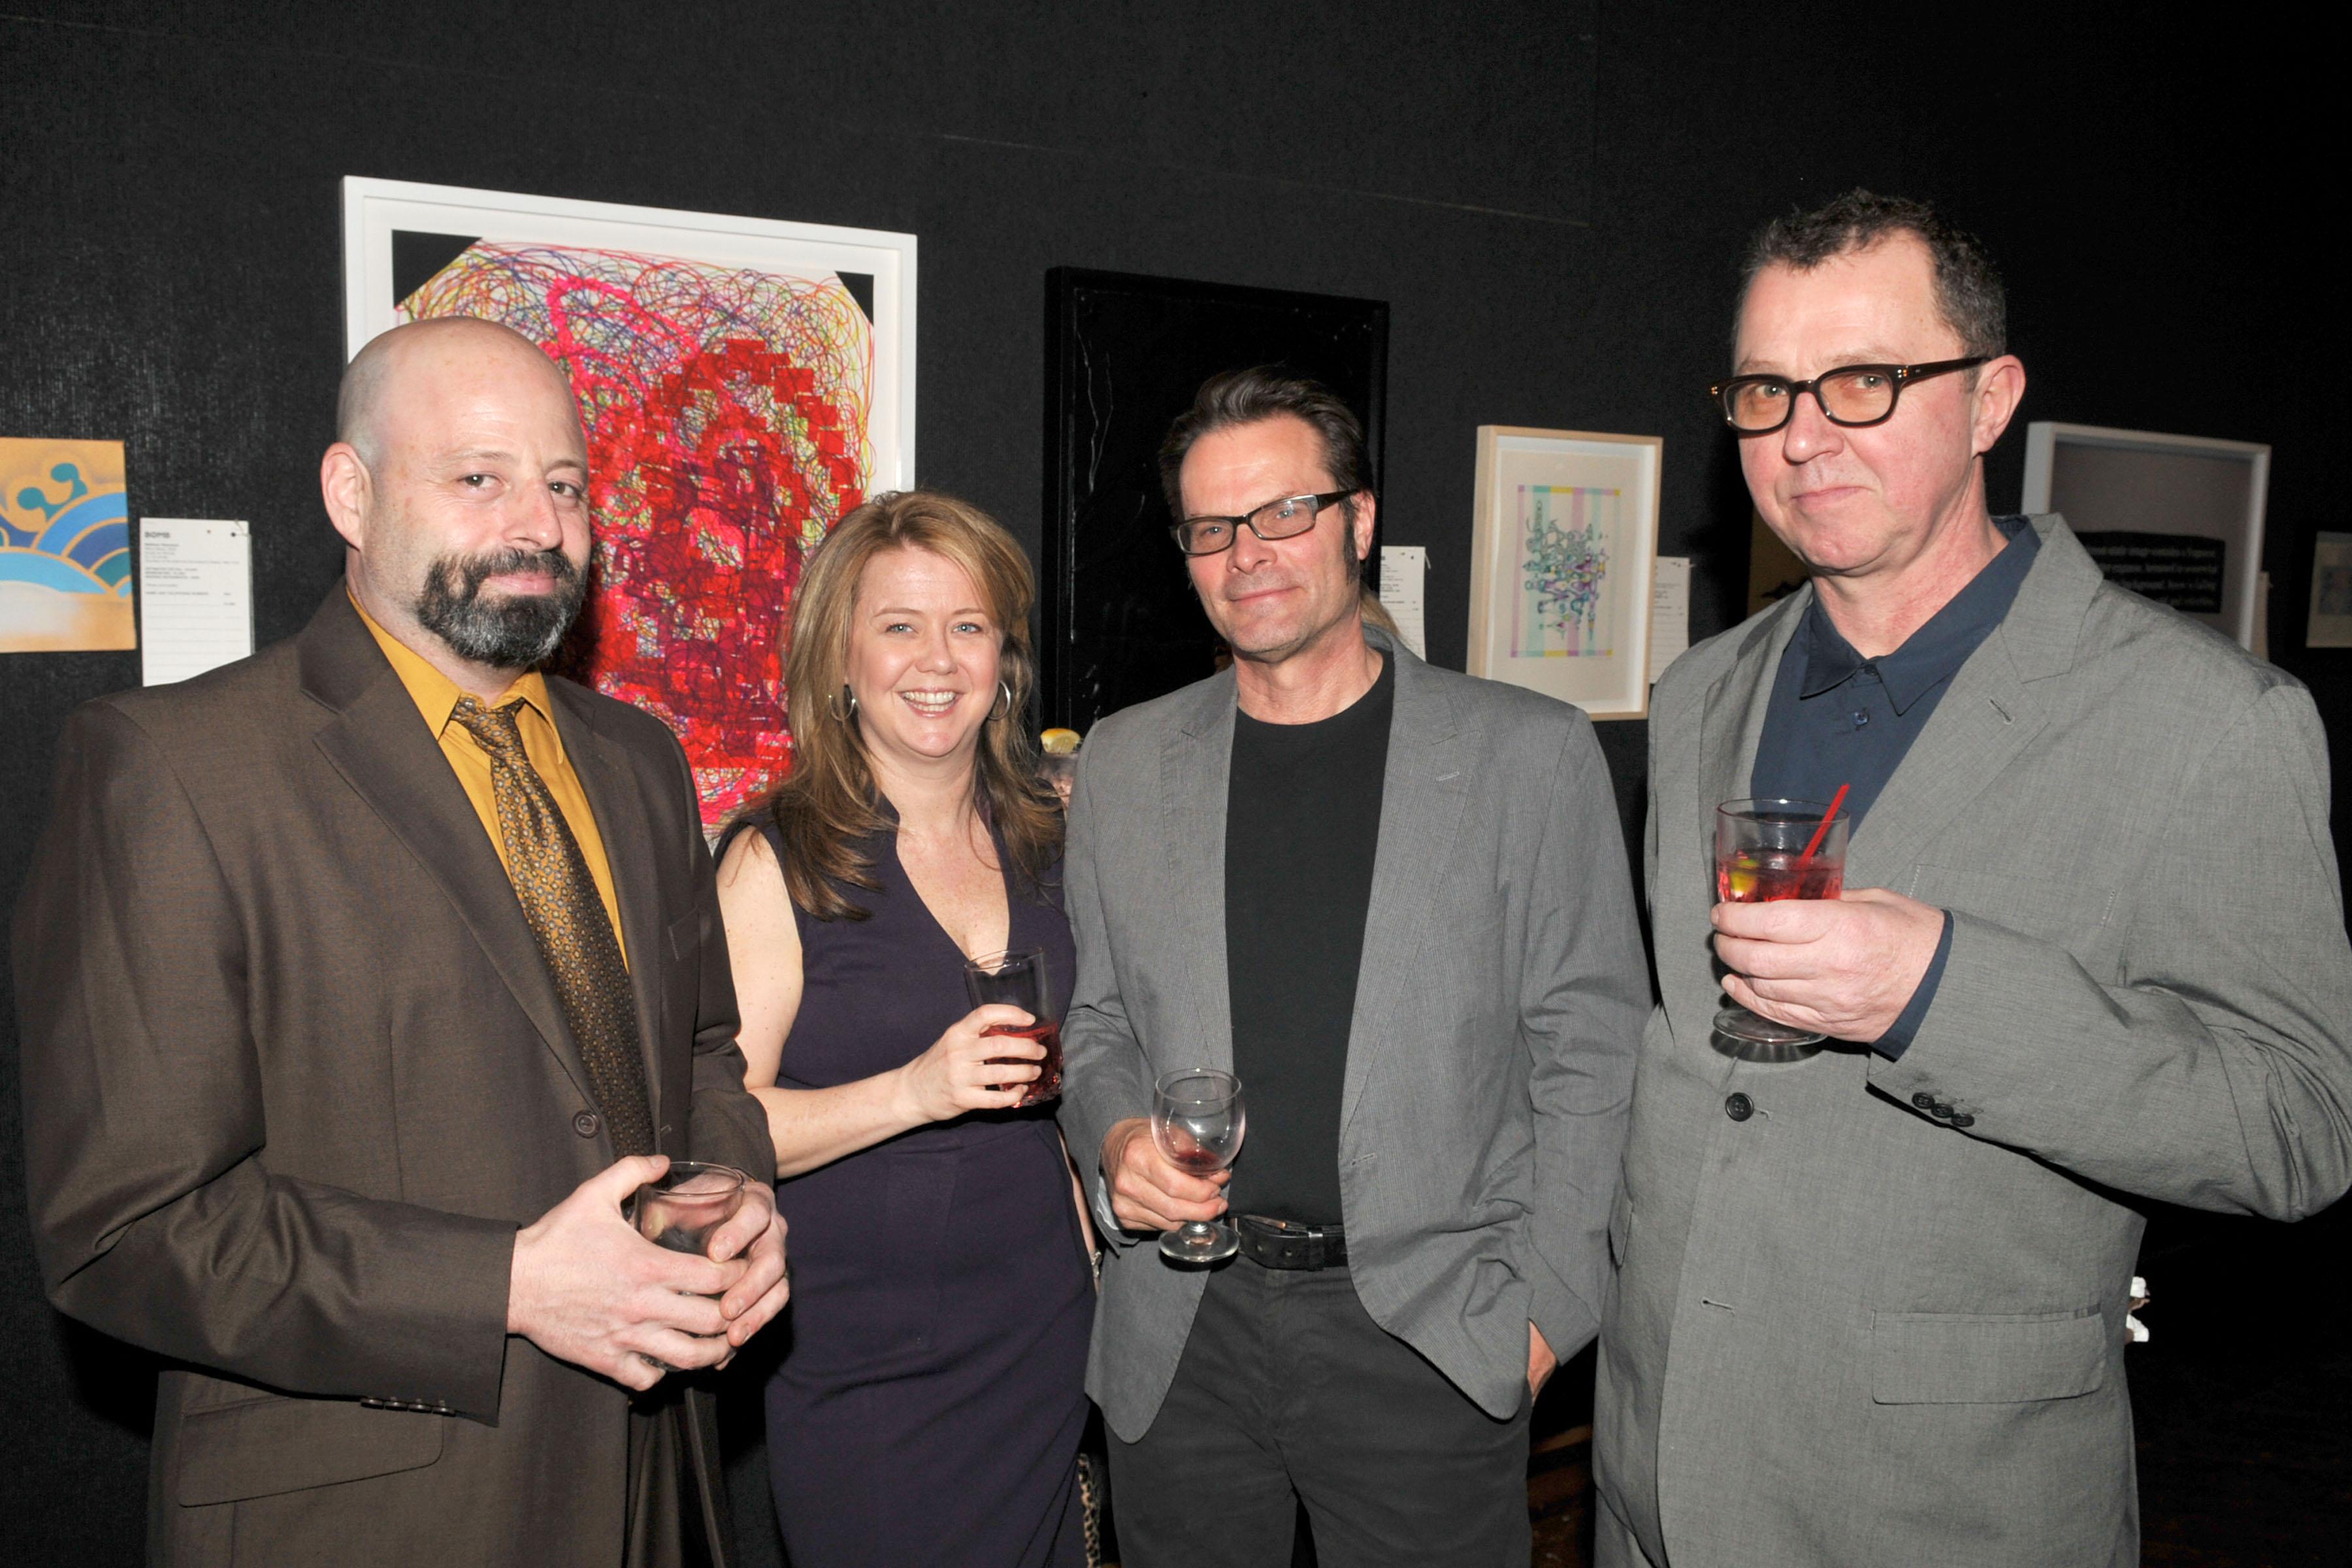 Joe Amrhein (center right) (Patrick McMullan)